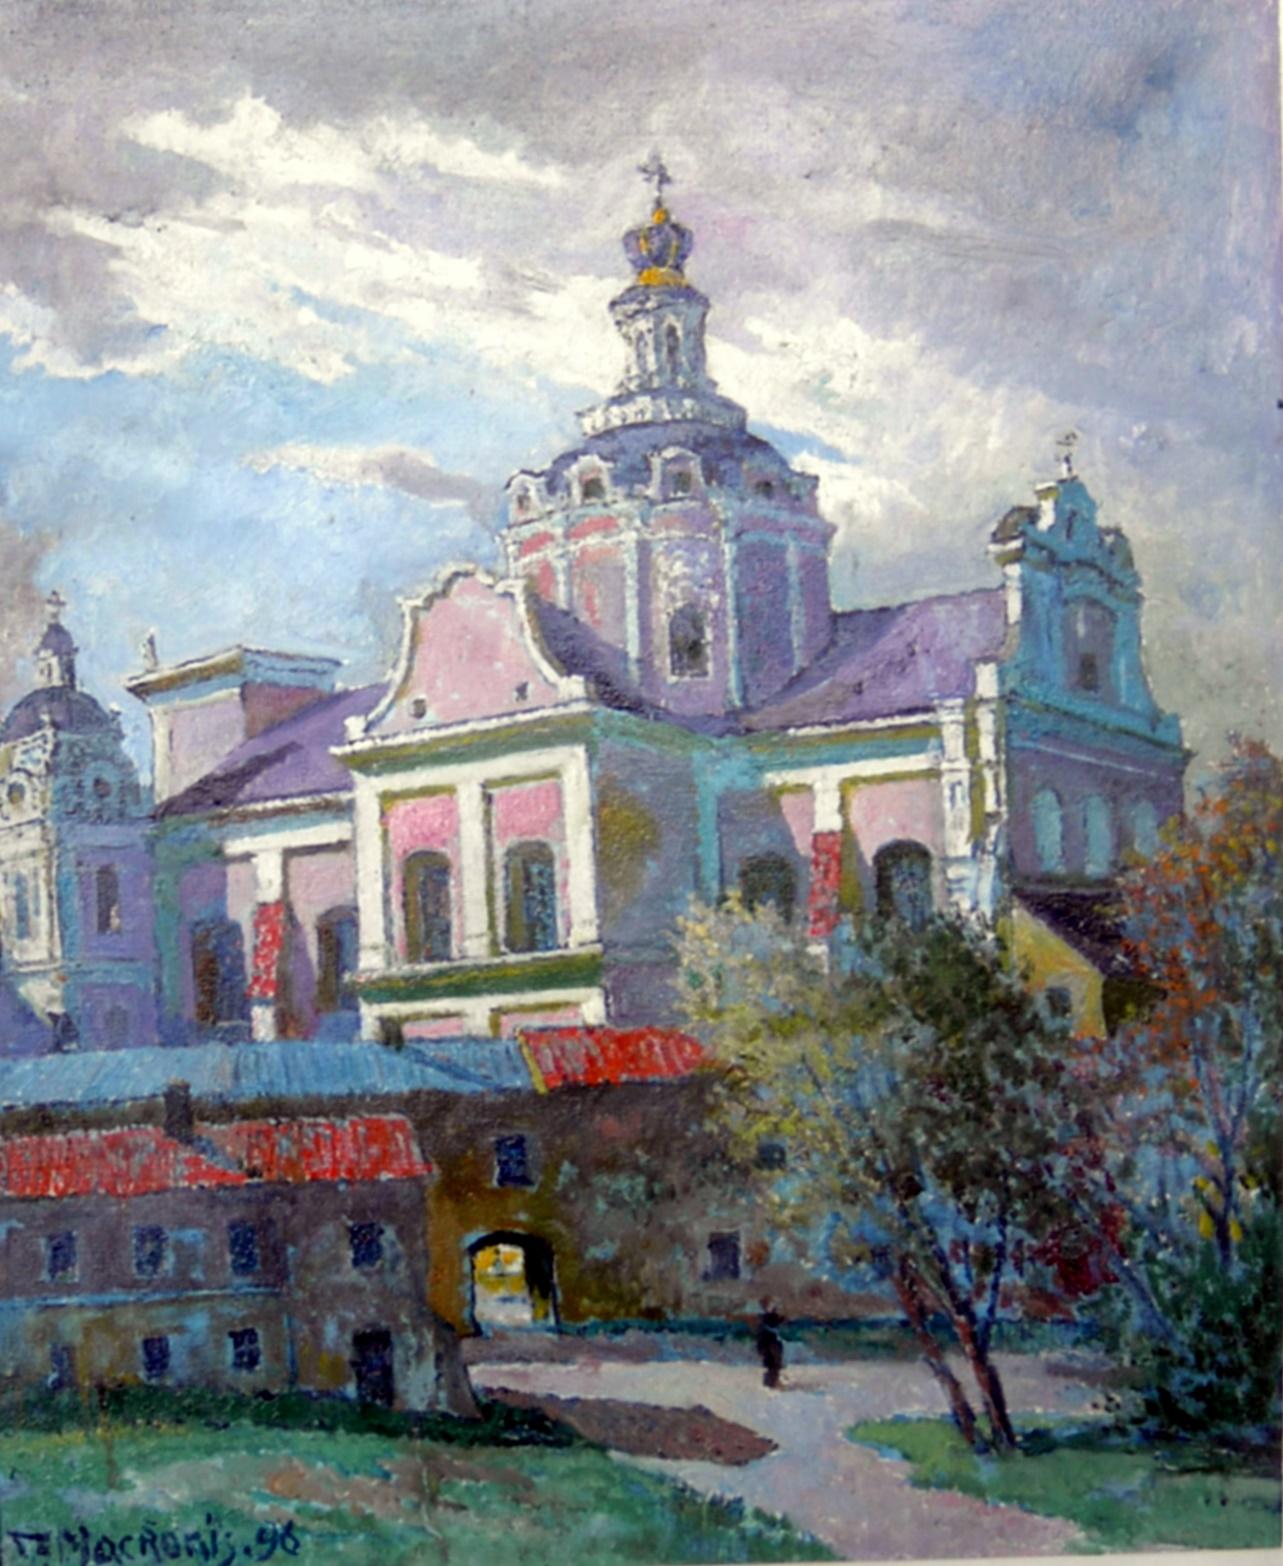 Šv. Kazimiero bažnyčia, 1996, 60x49